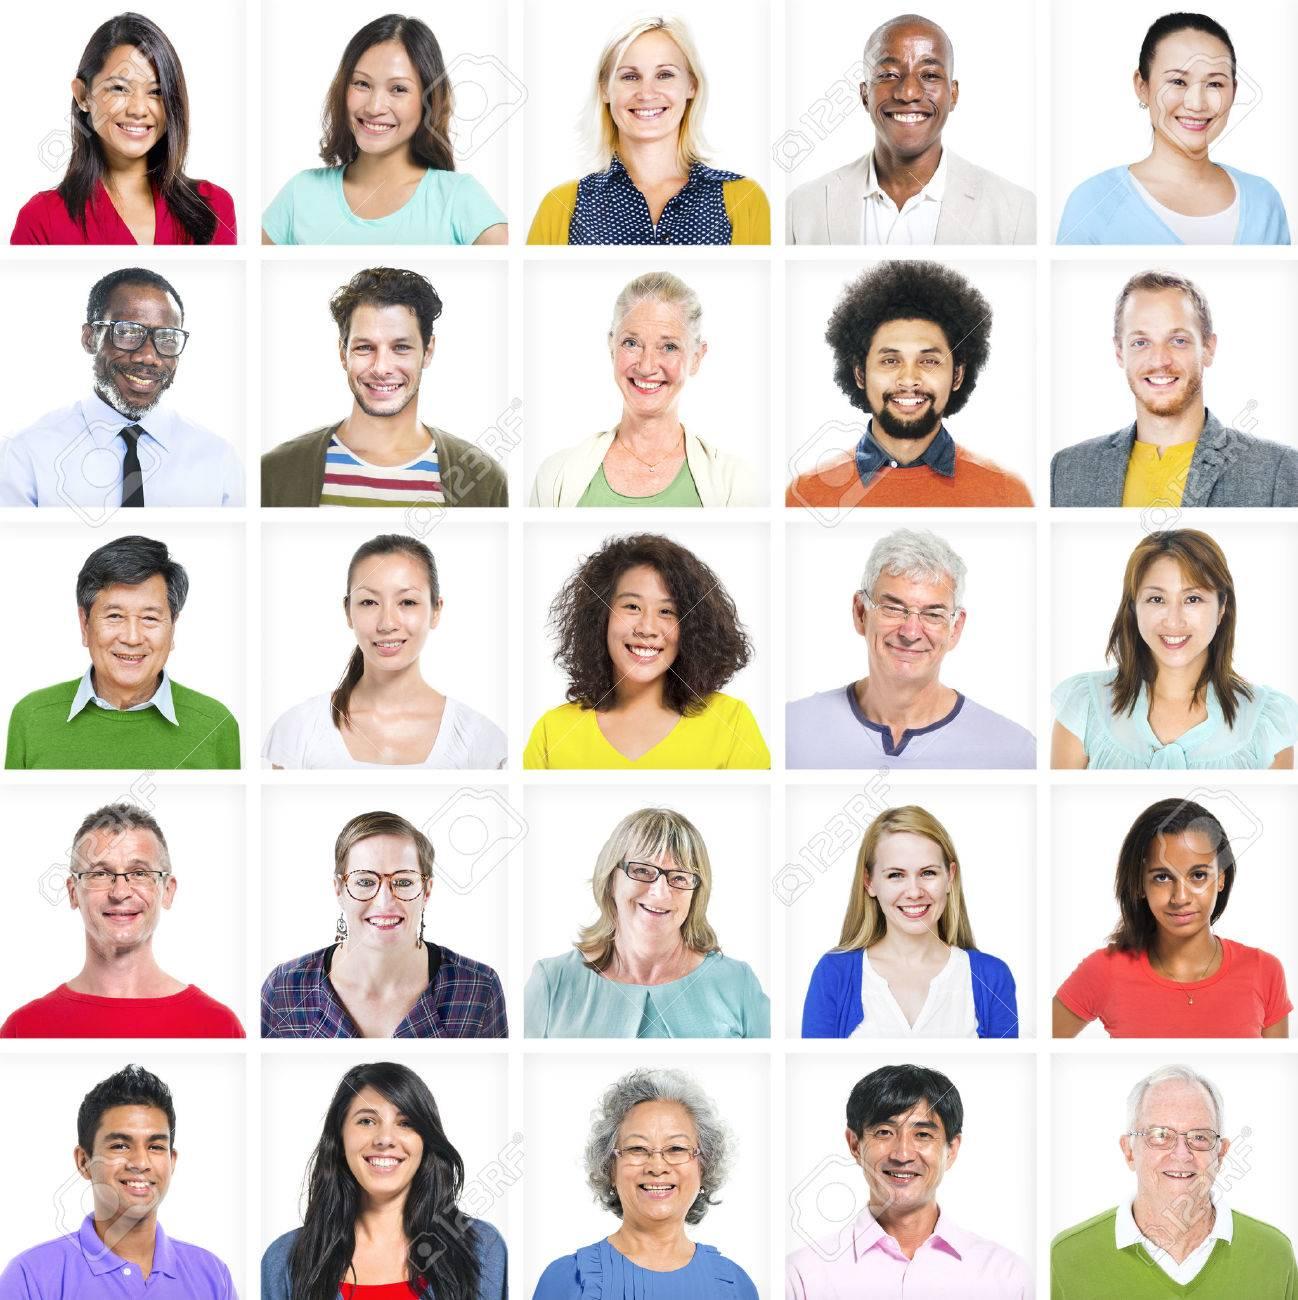 Portrait of Multiethnic Colorful Diverse People - 31293189